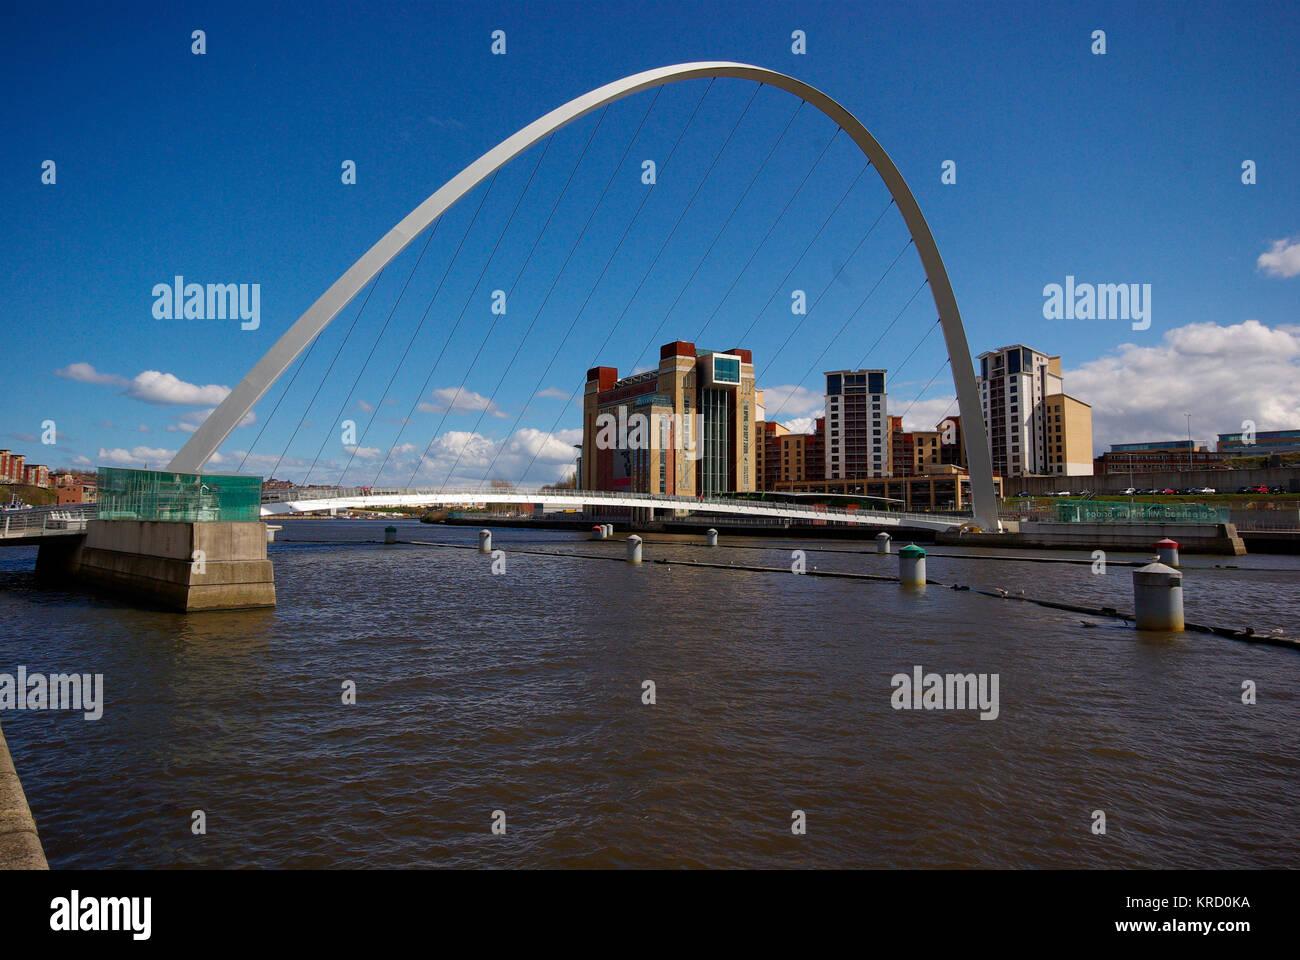 The Gateshead Millennium Bridge. A pedestrian and cyclist tilt bridge spanning the River Tyne Gateshead on the south - Stock Image